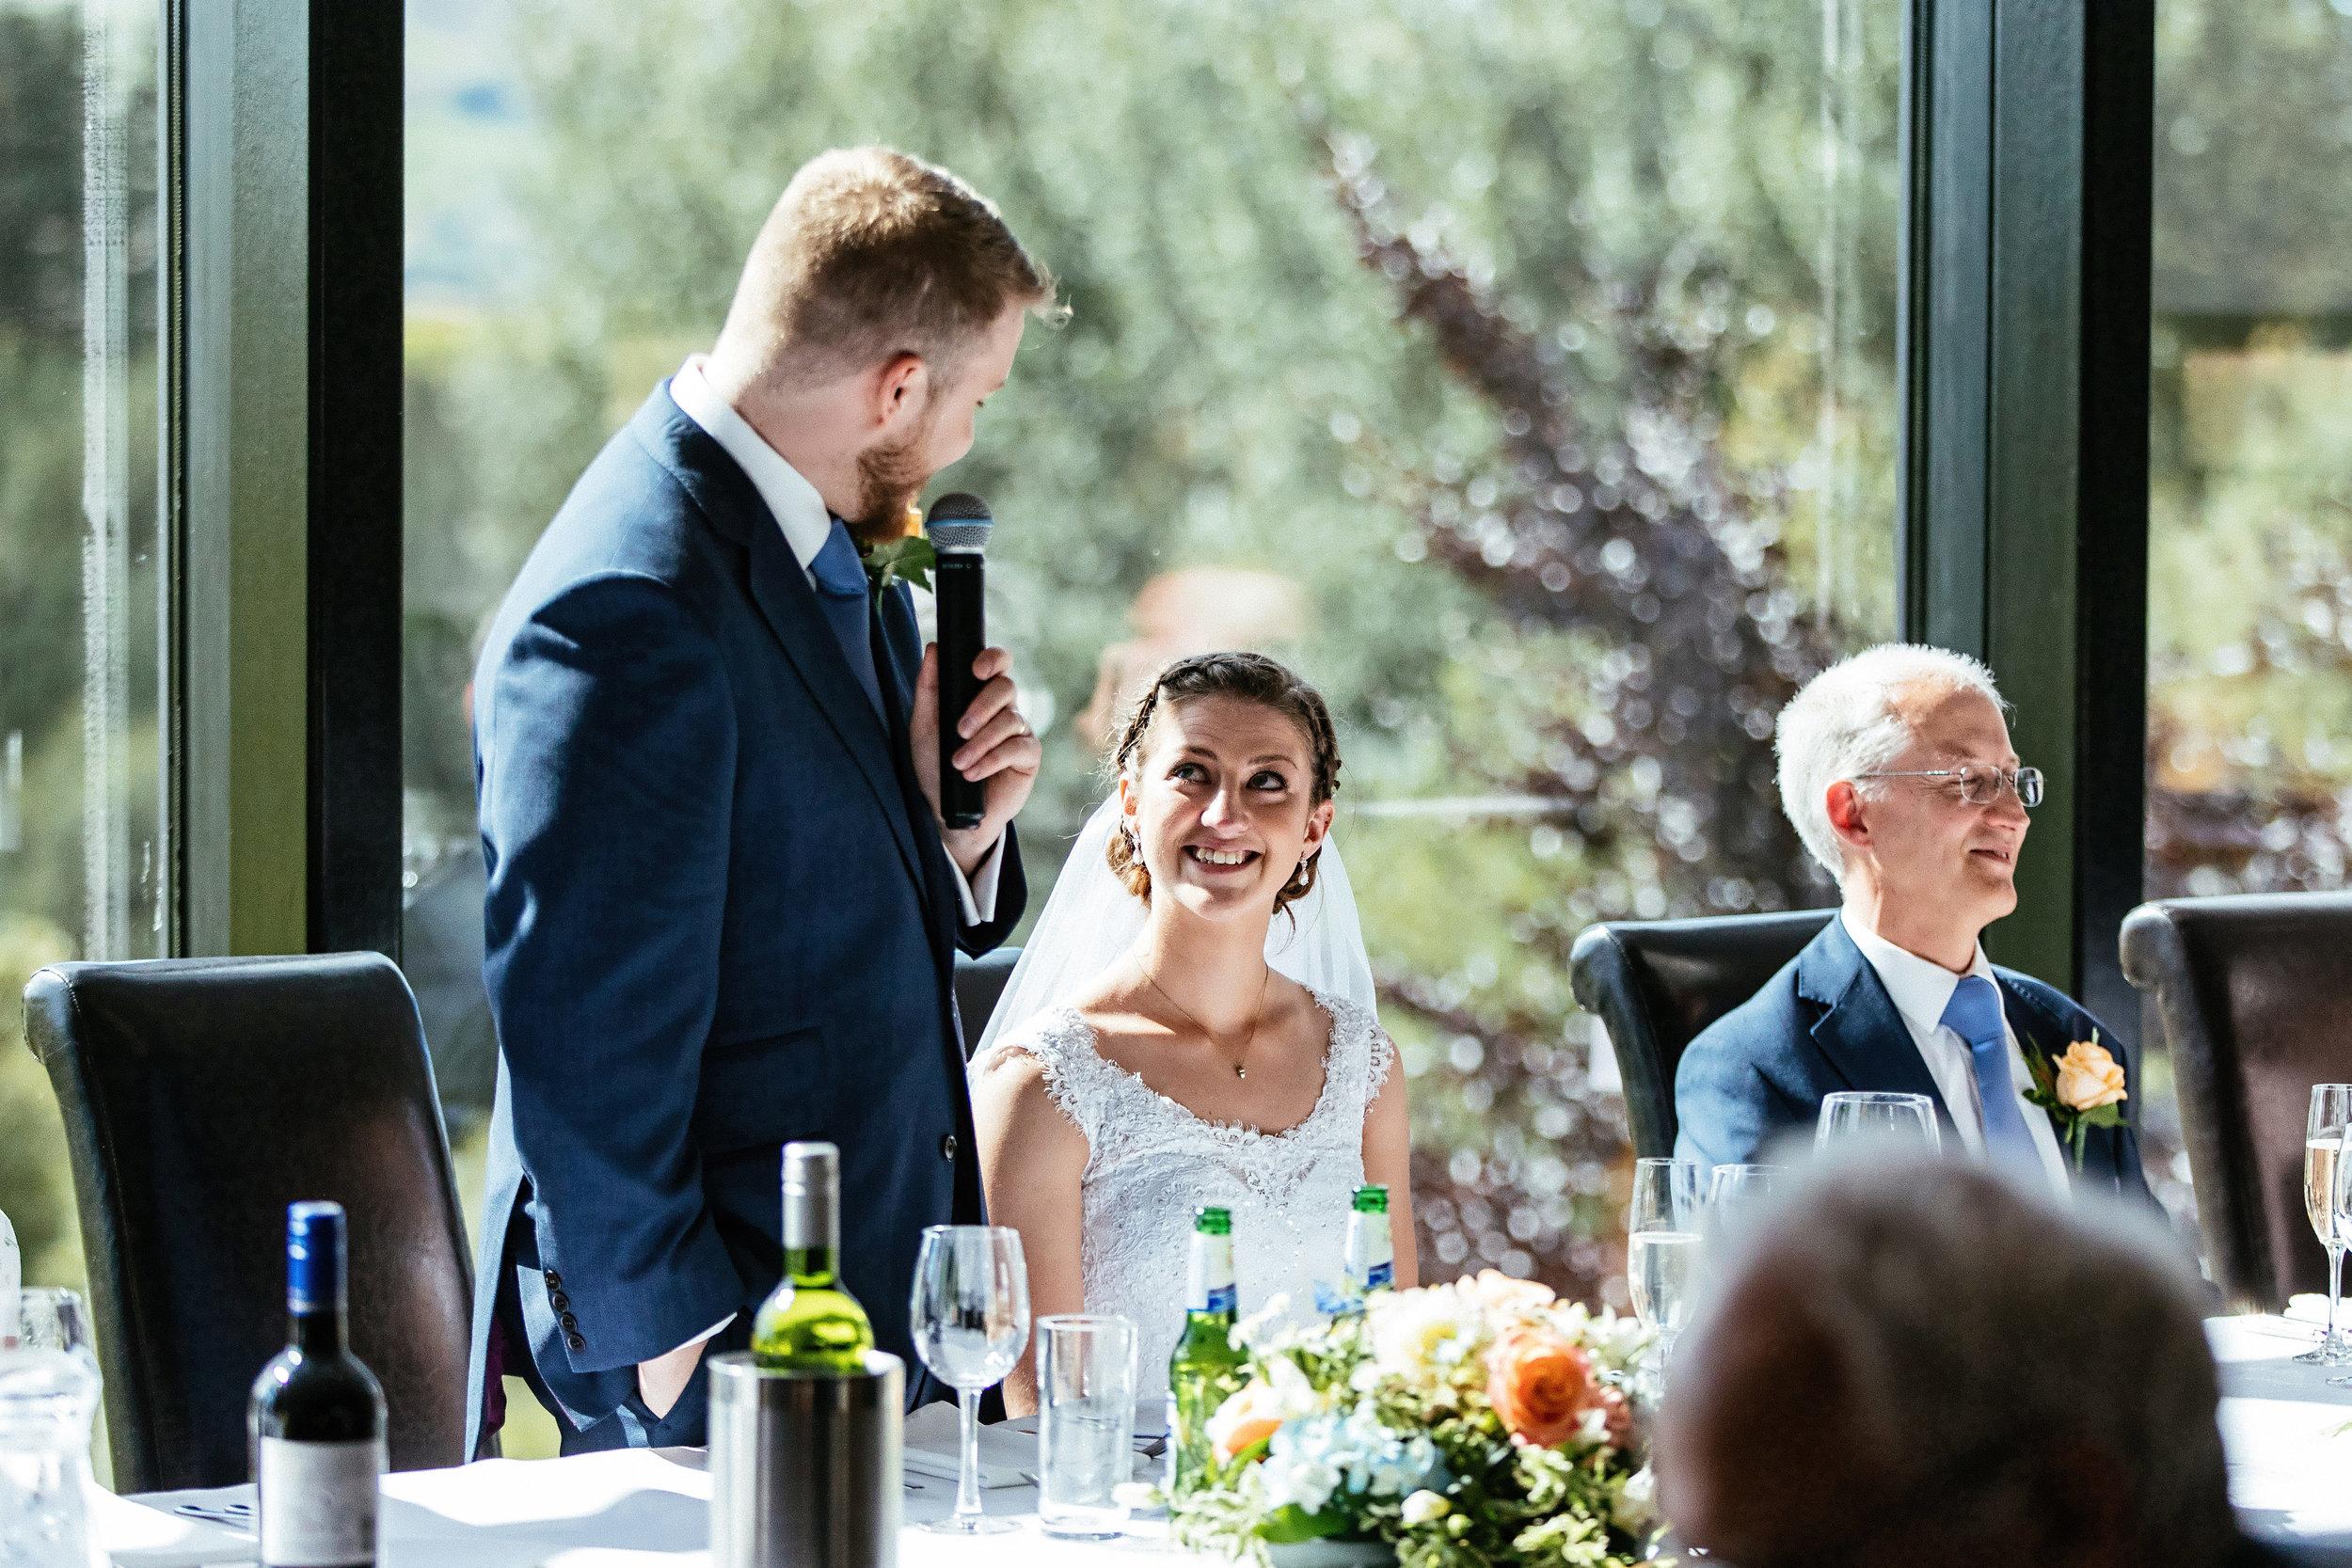 Kathryn-and-Mike-Wedding-Highlights-82.jpg